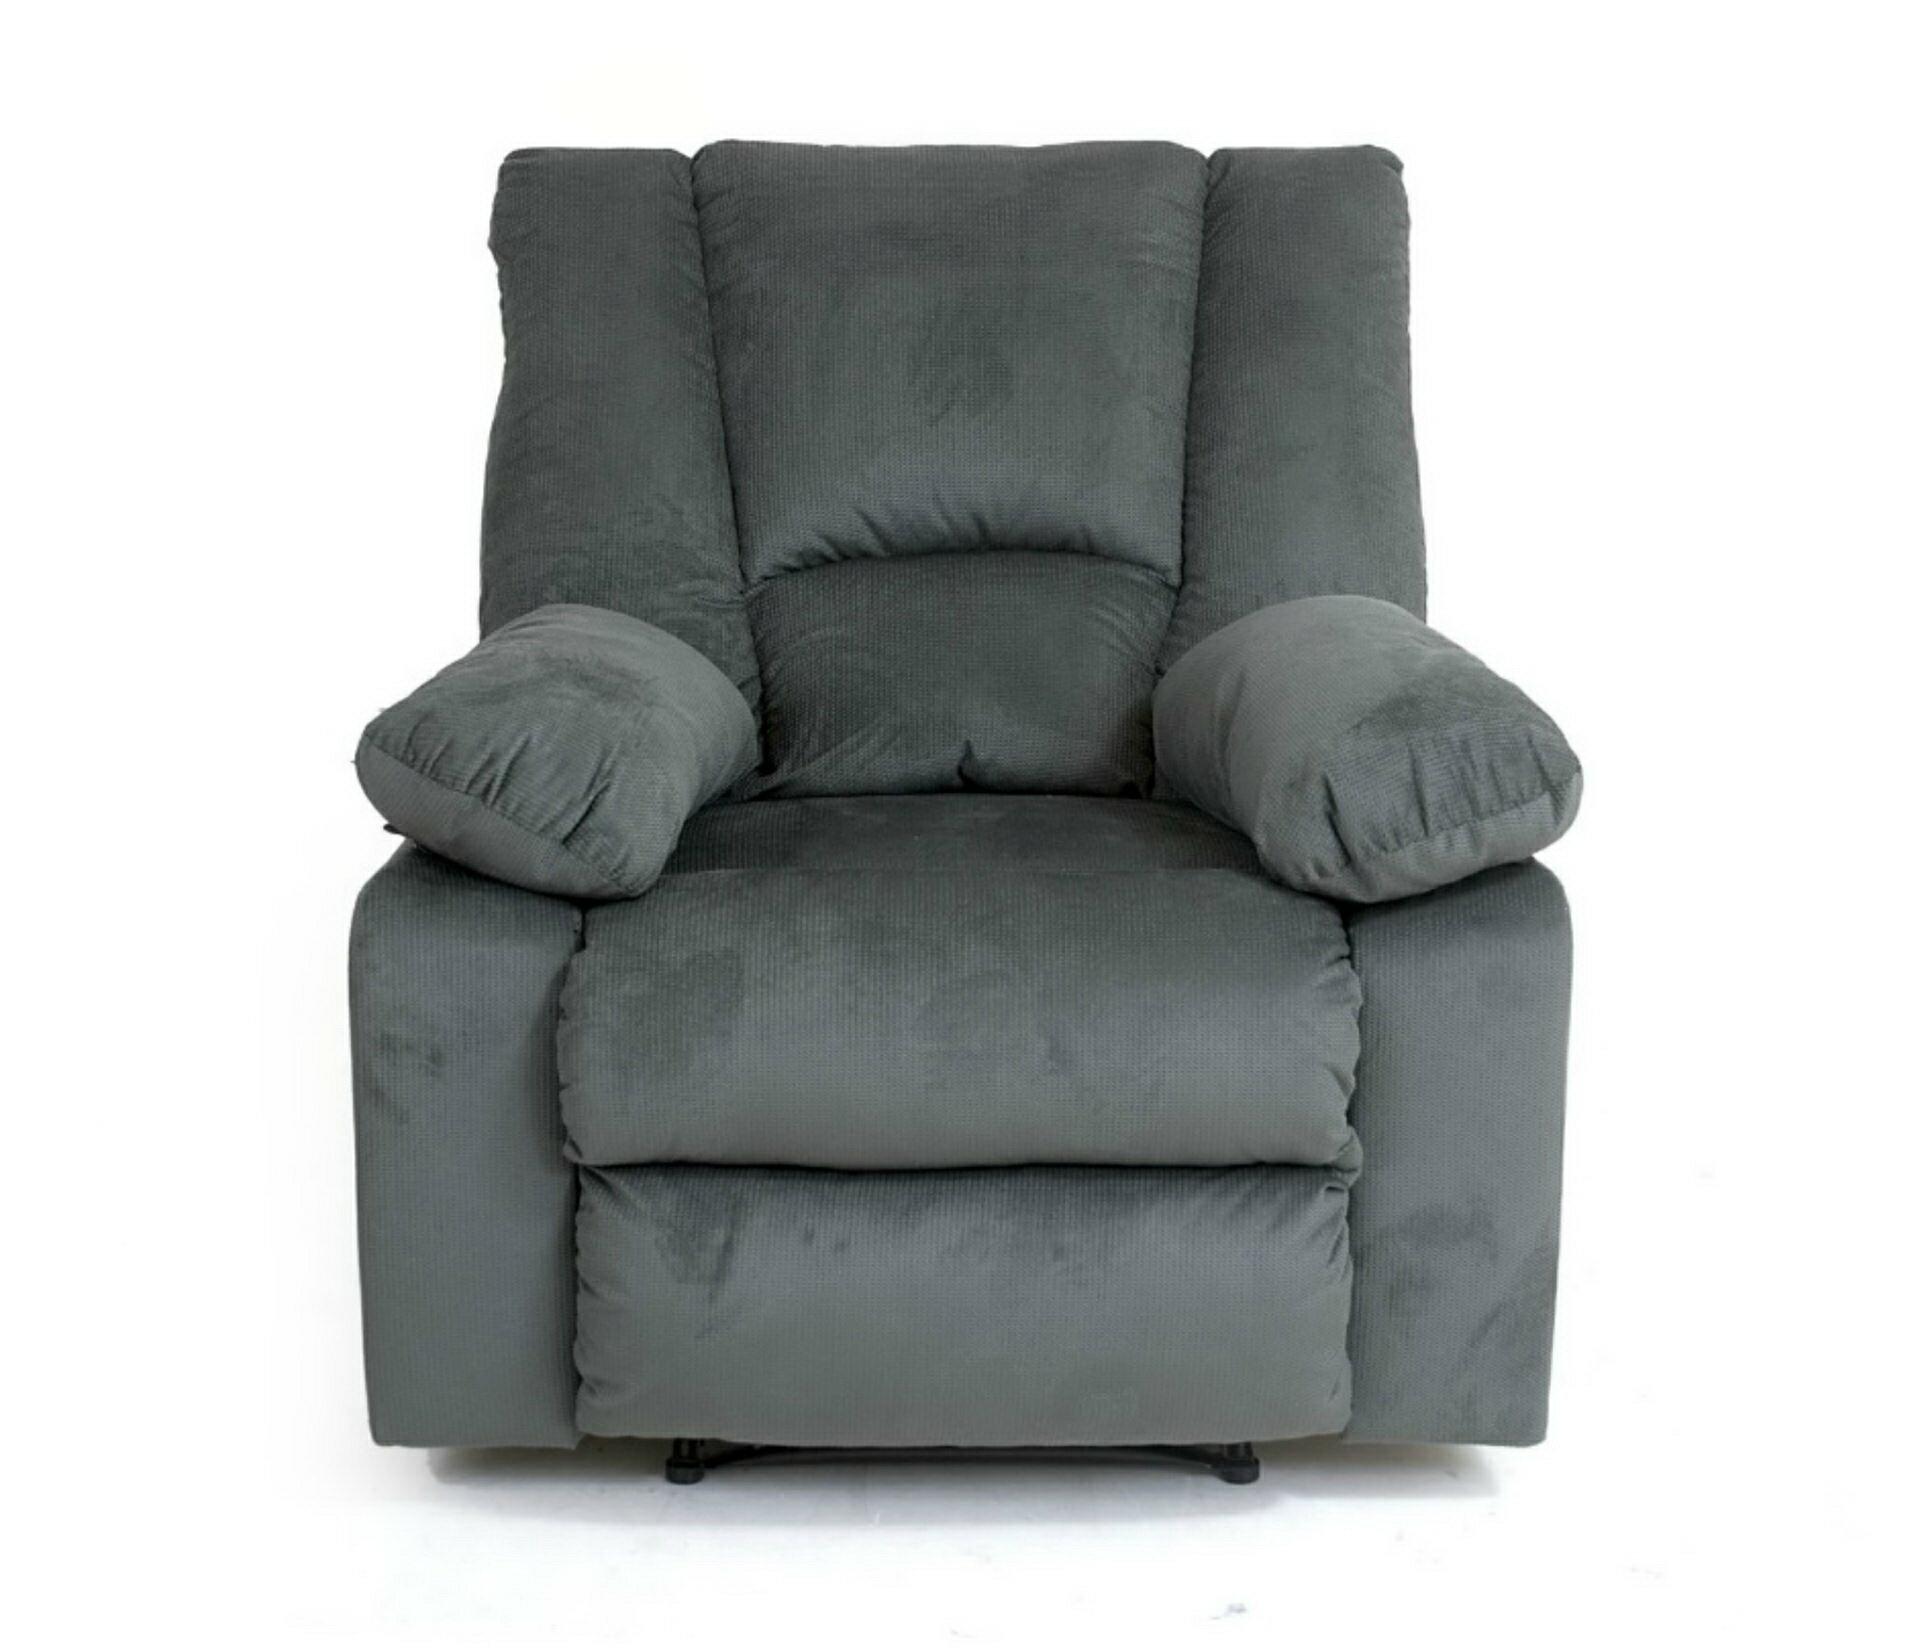 Ashley愛室麗家居 ~U737 多 一人座沙發 鐵灰色